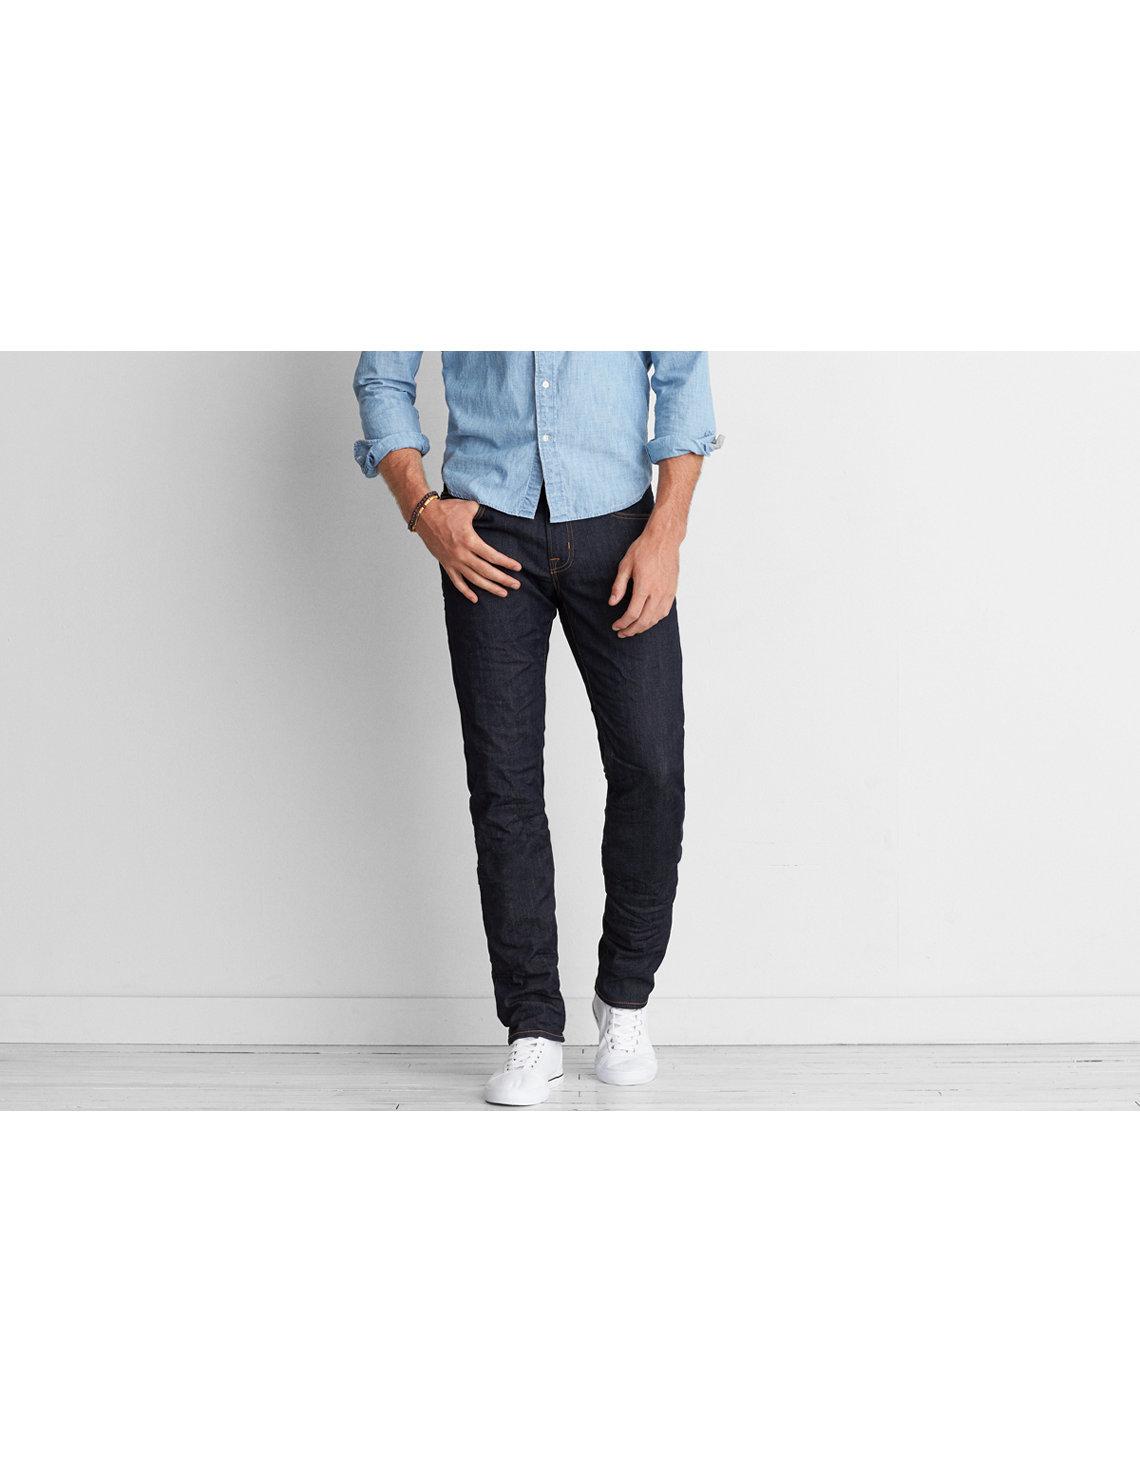 Mens jeans design legends jeans - Ae Extreme Flex Slim Straight Jean